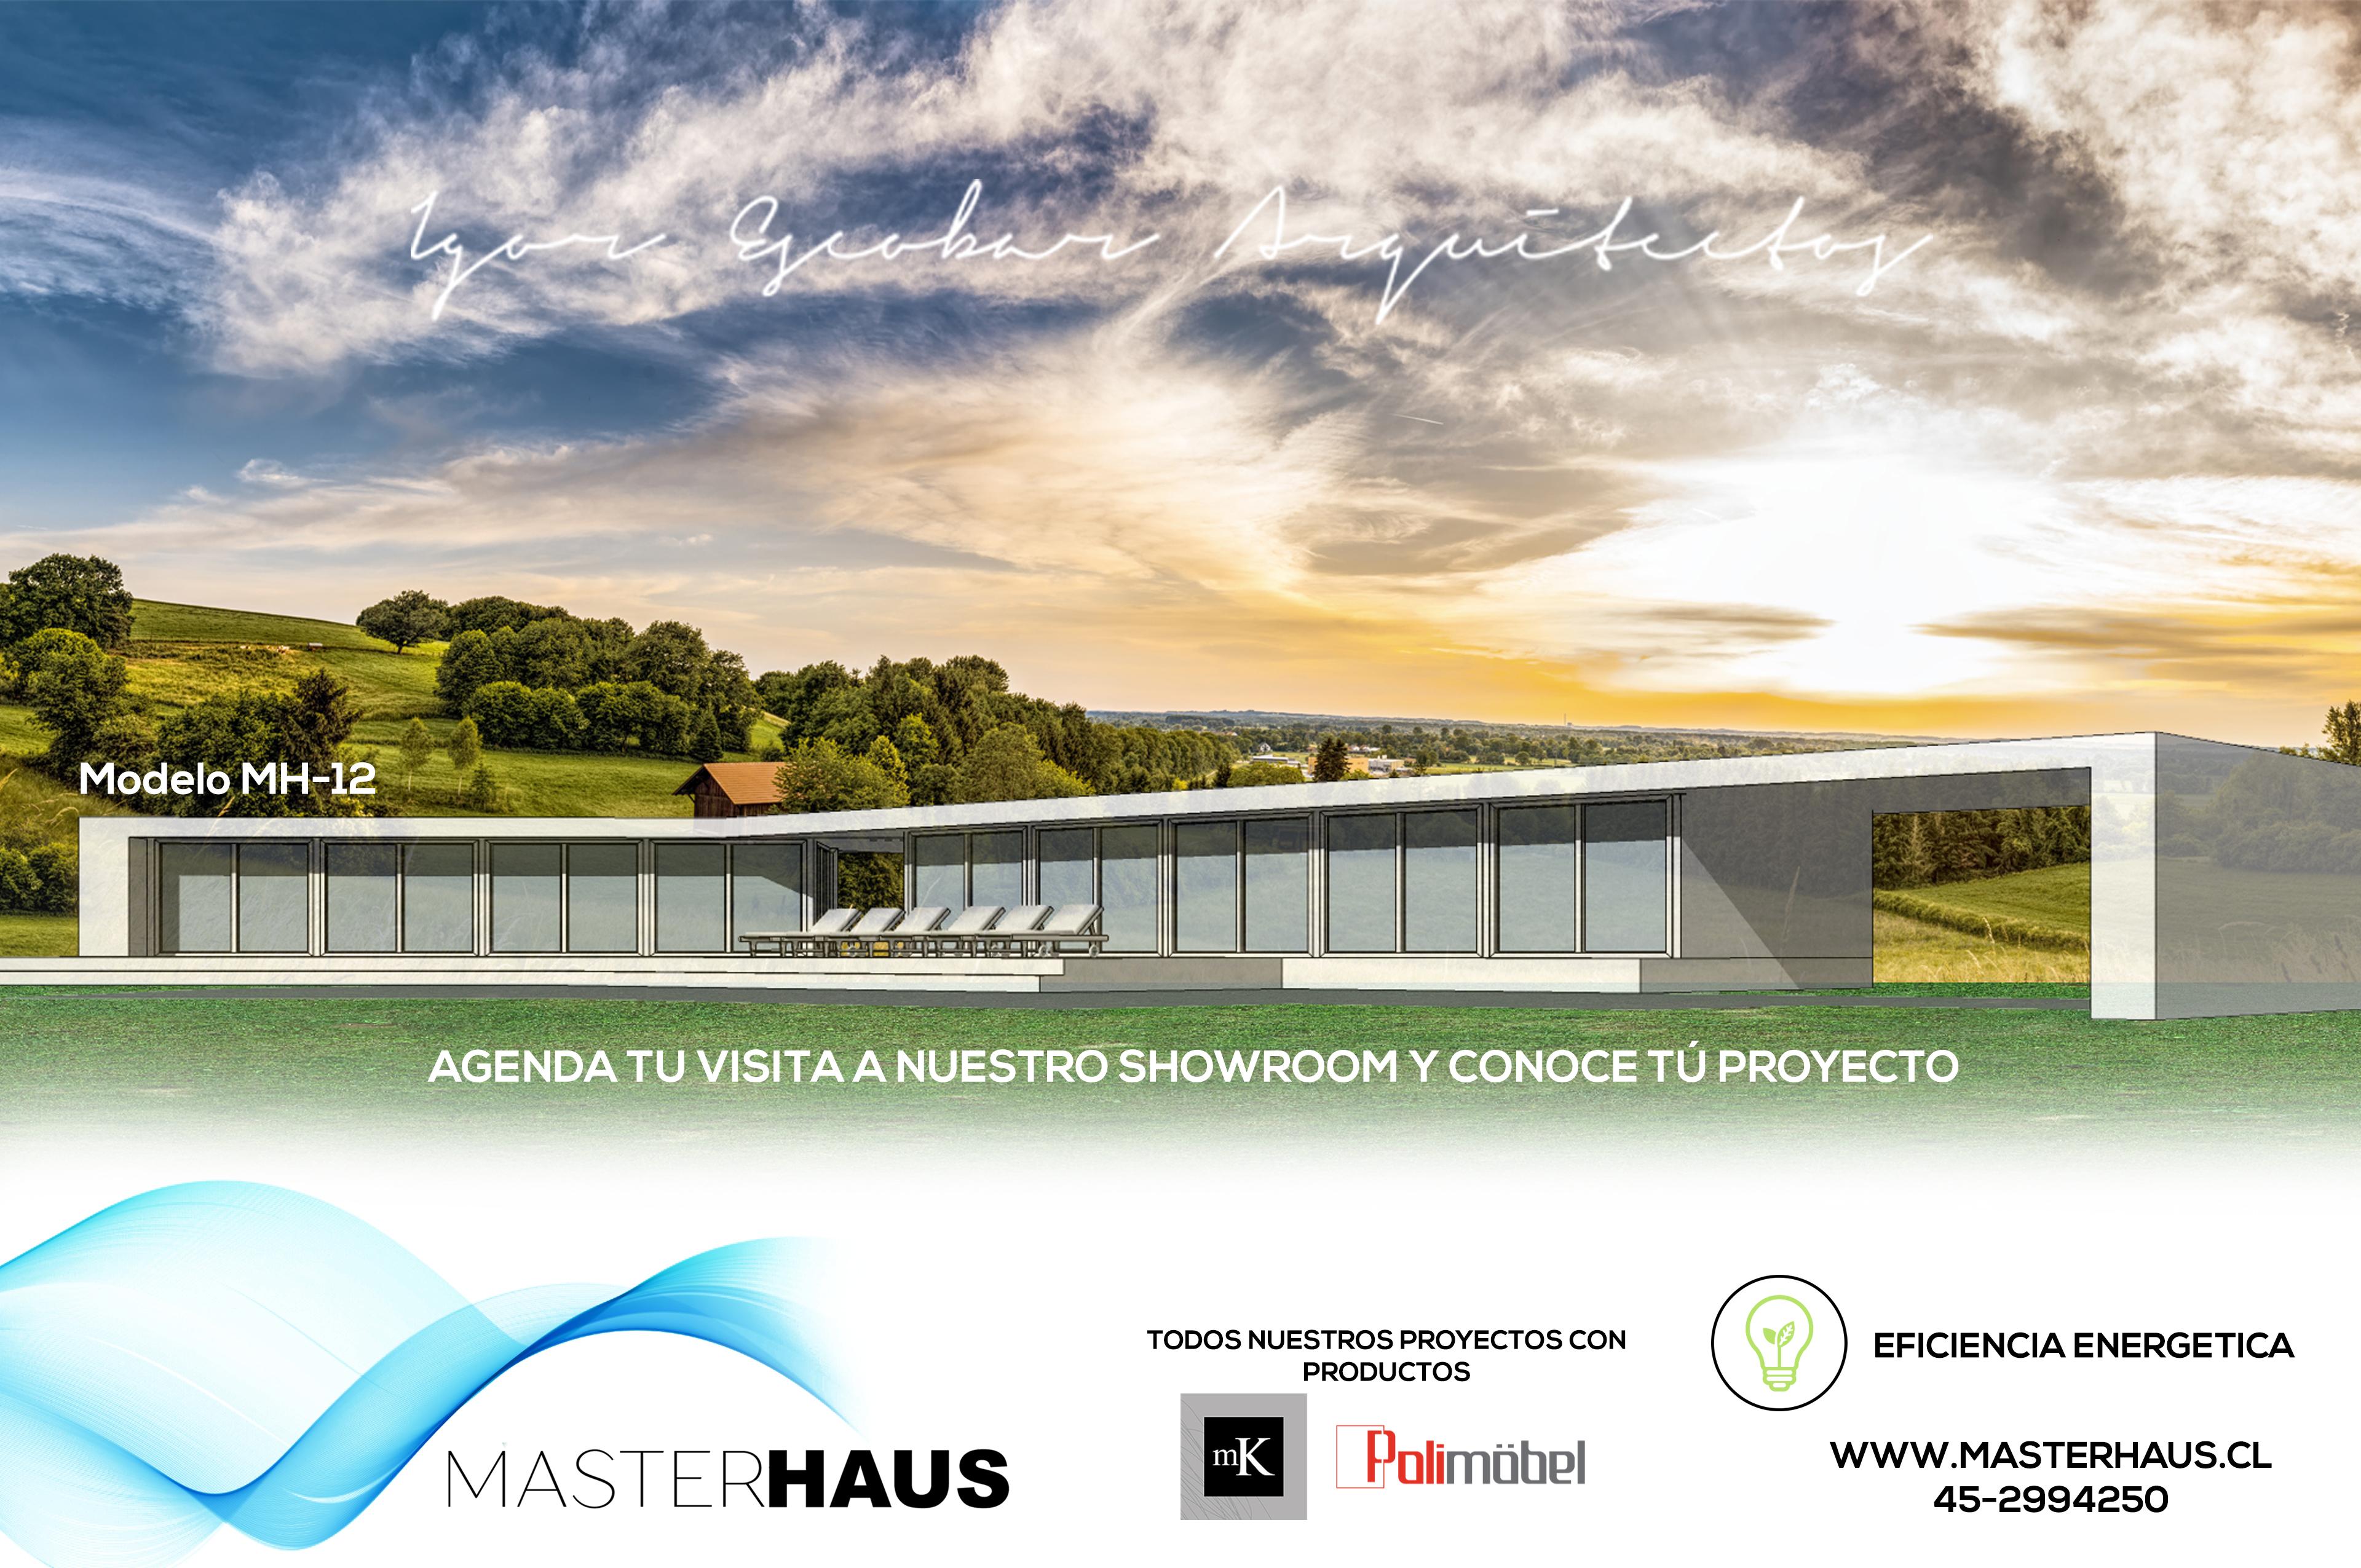 Masterhaus mod. MH12